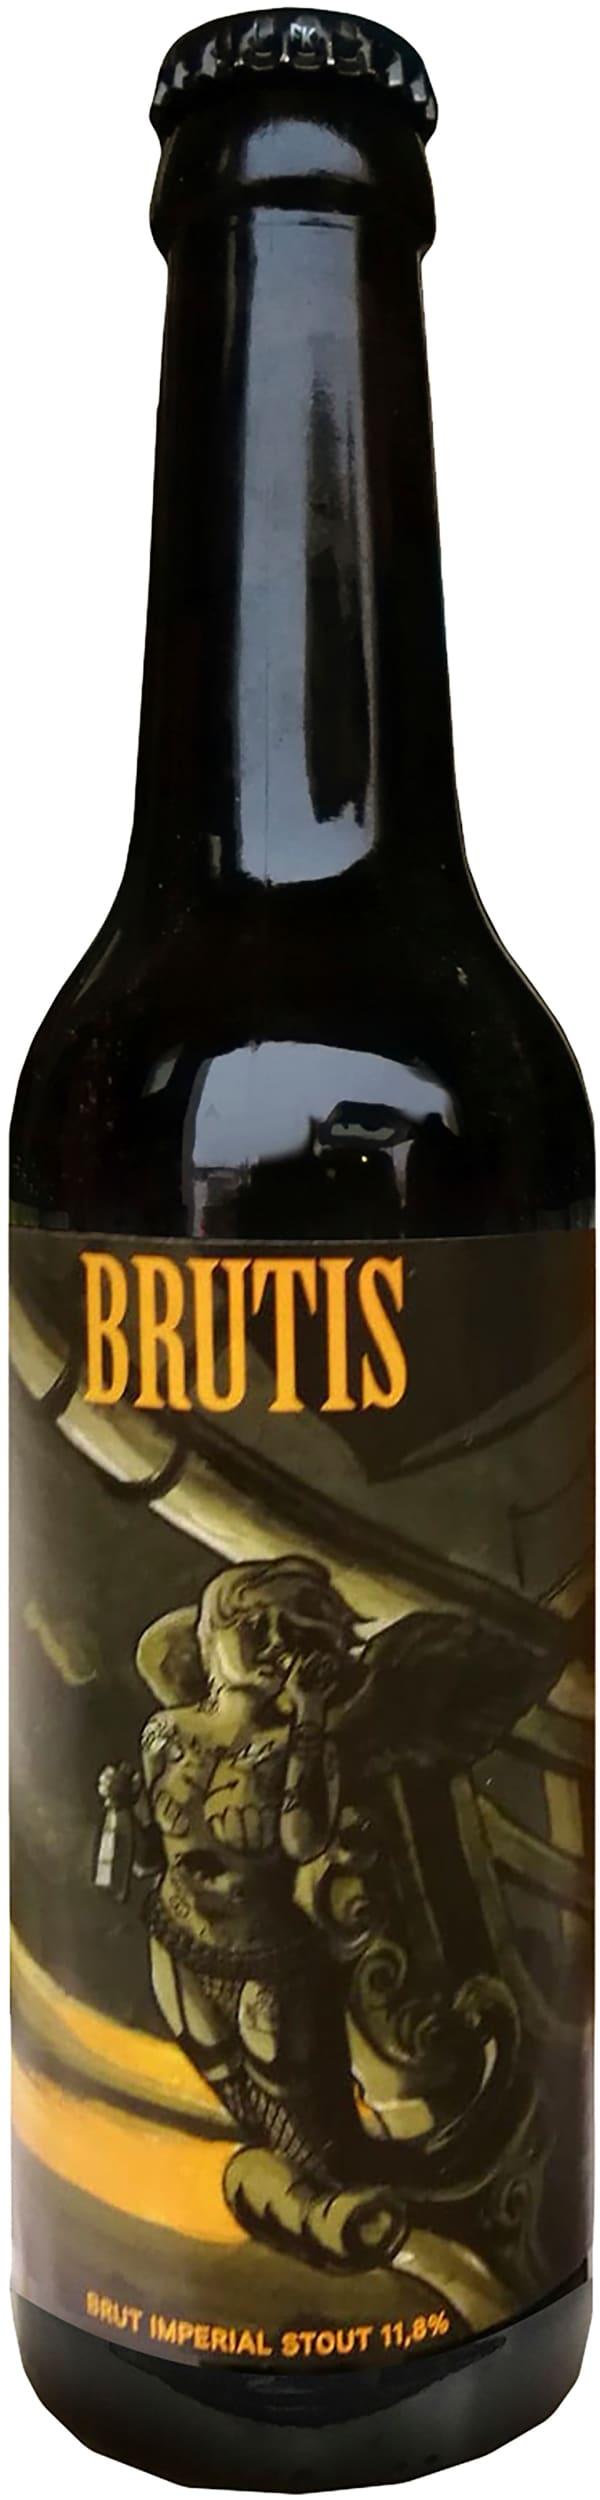 Sonnisaari Brutis